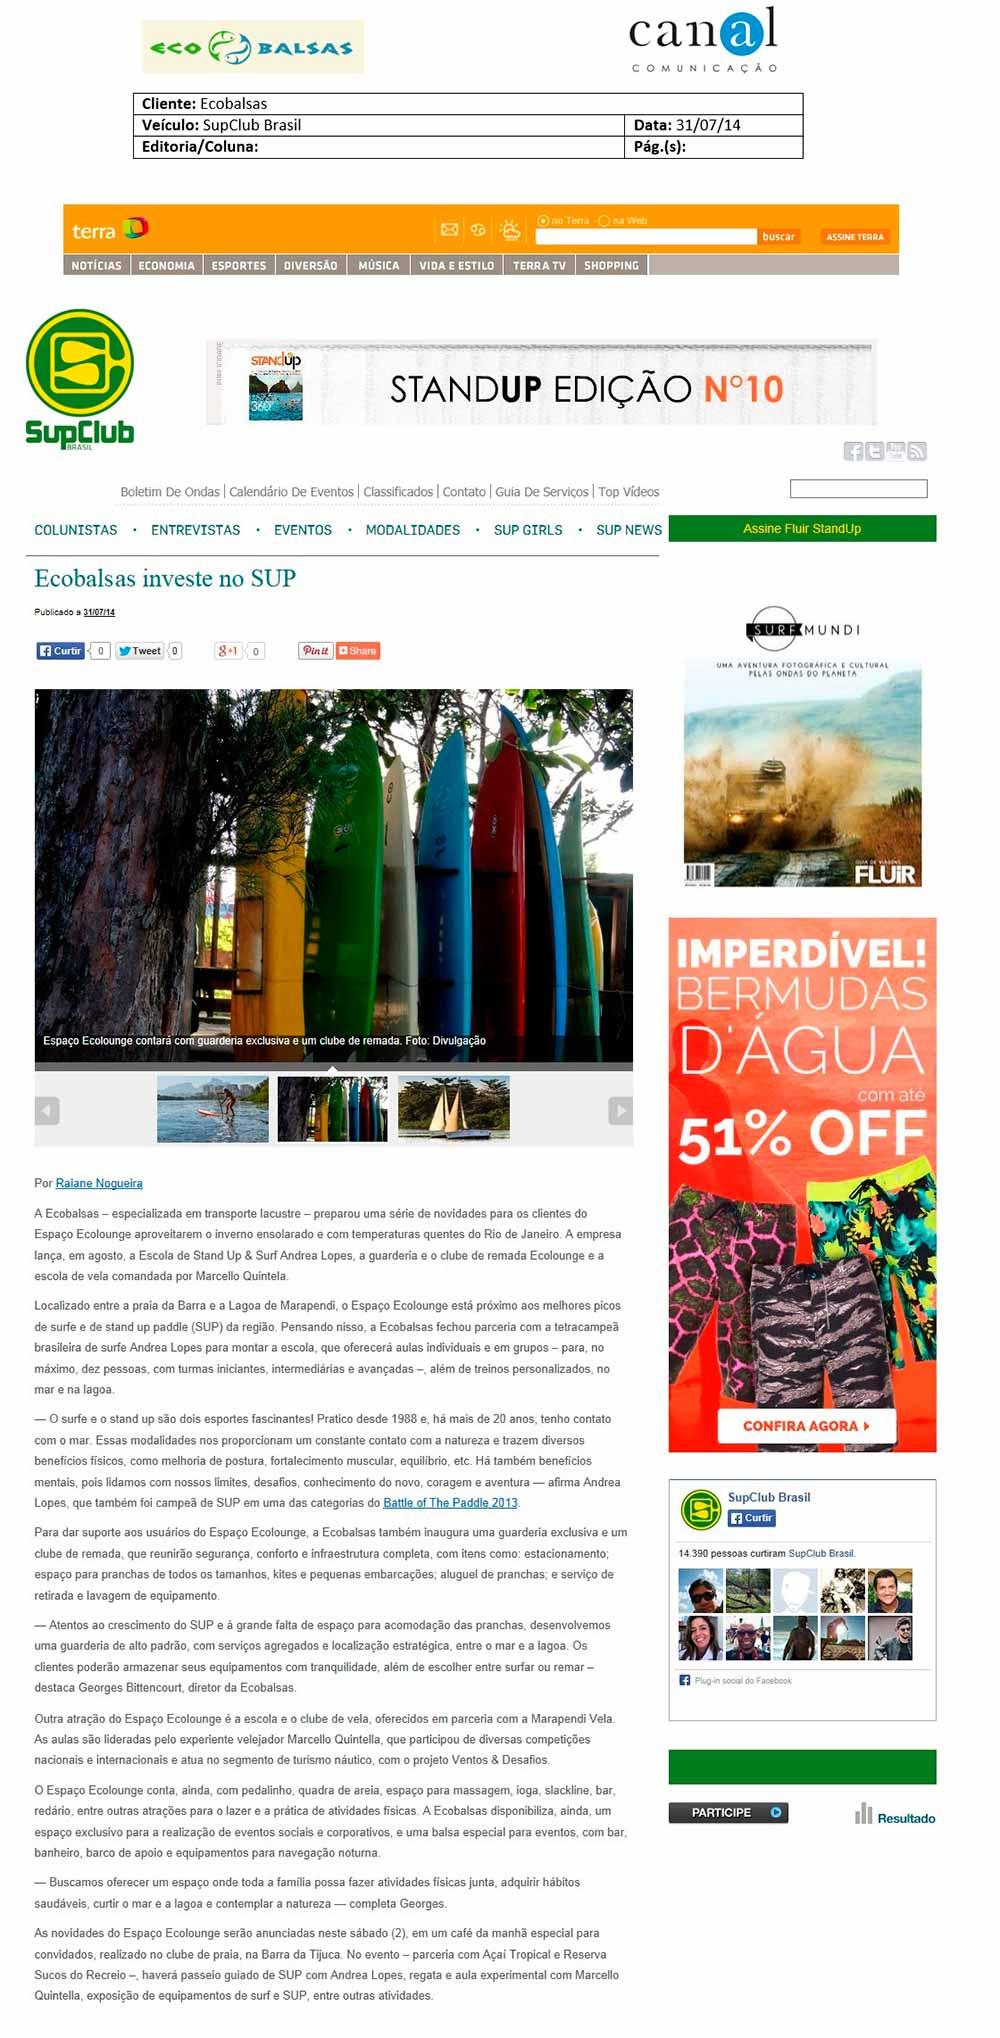 7-Ecobalsas_SupClub-Brasil_31.07